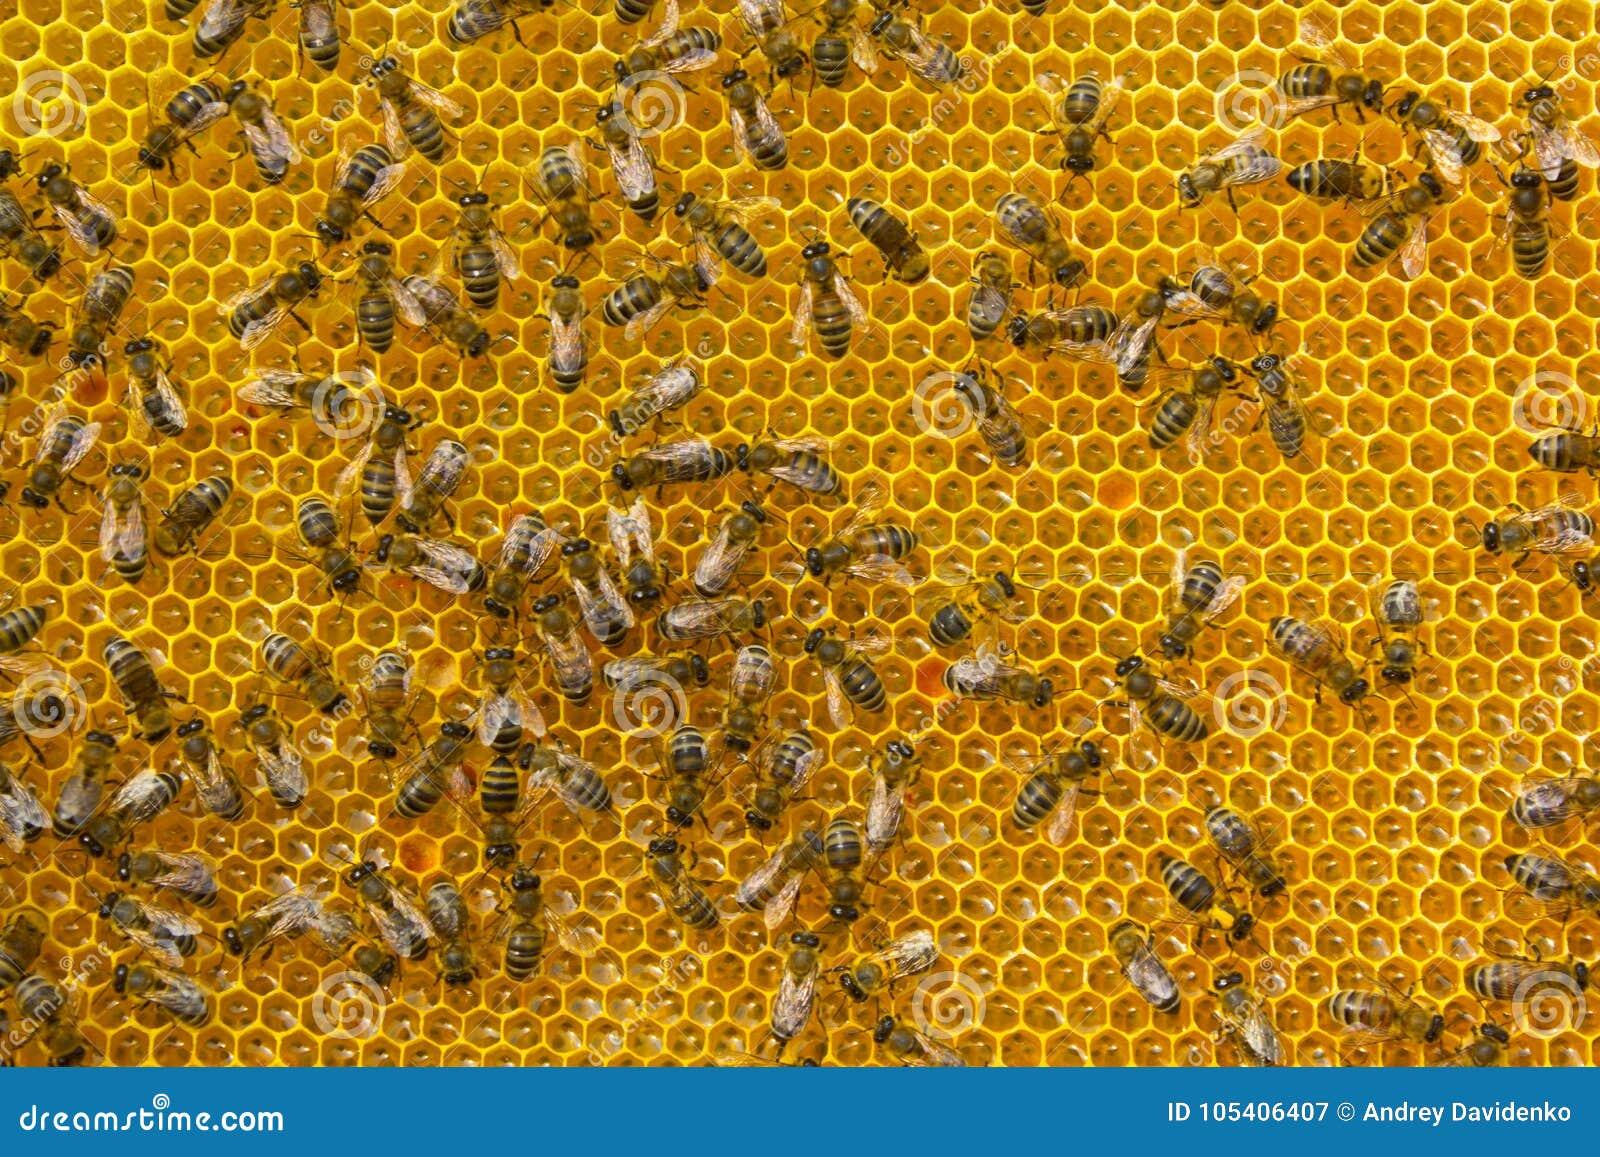 Download Οι νέες μέλισσες μετατρέπουν το νέκταρ στο μέλι Στοκ Εικόνα - εικόνα από τρόφιμα, χτένα: 105406407